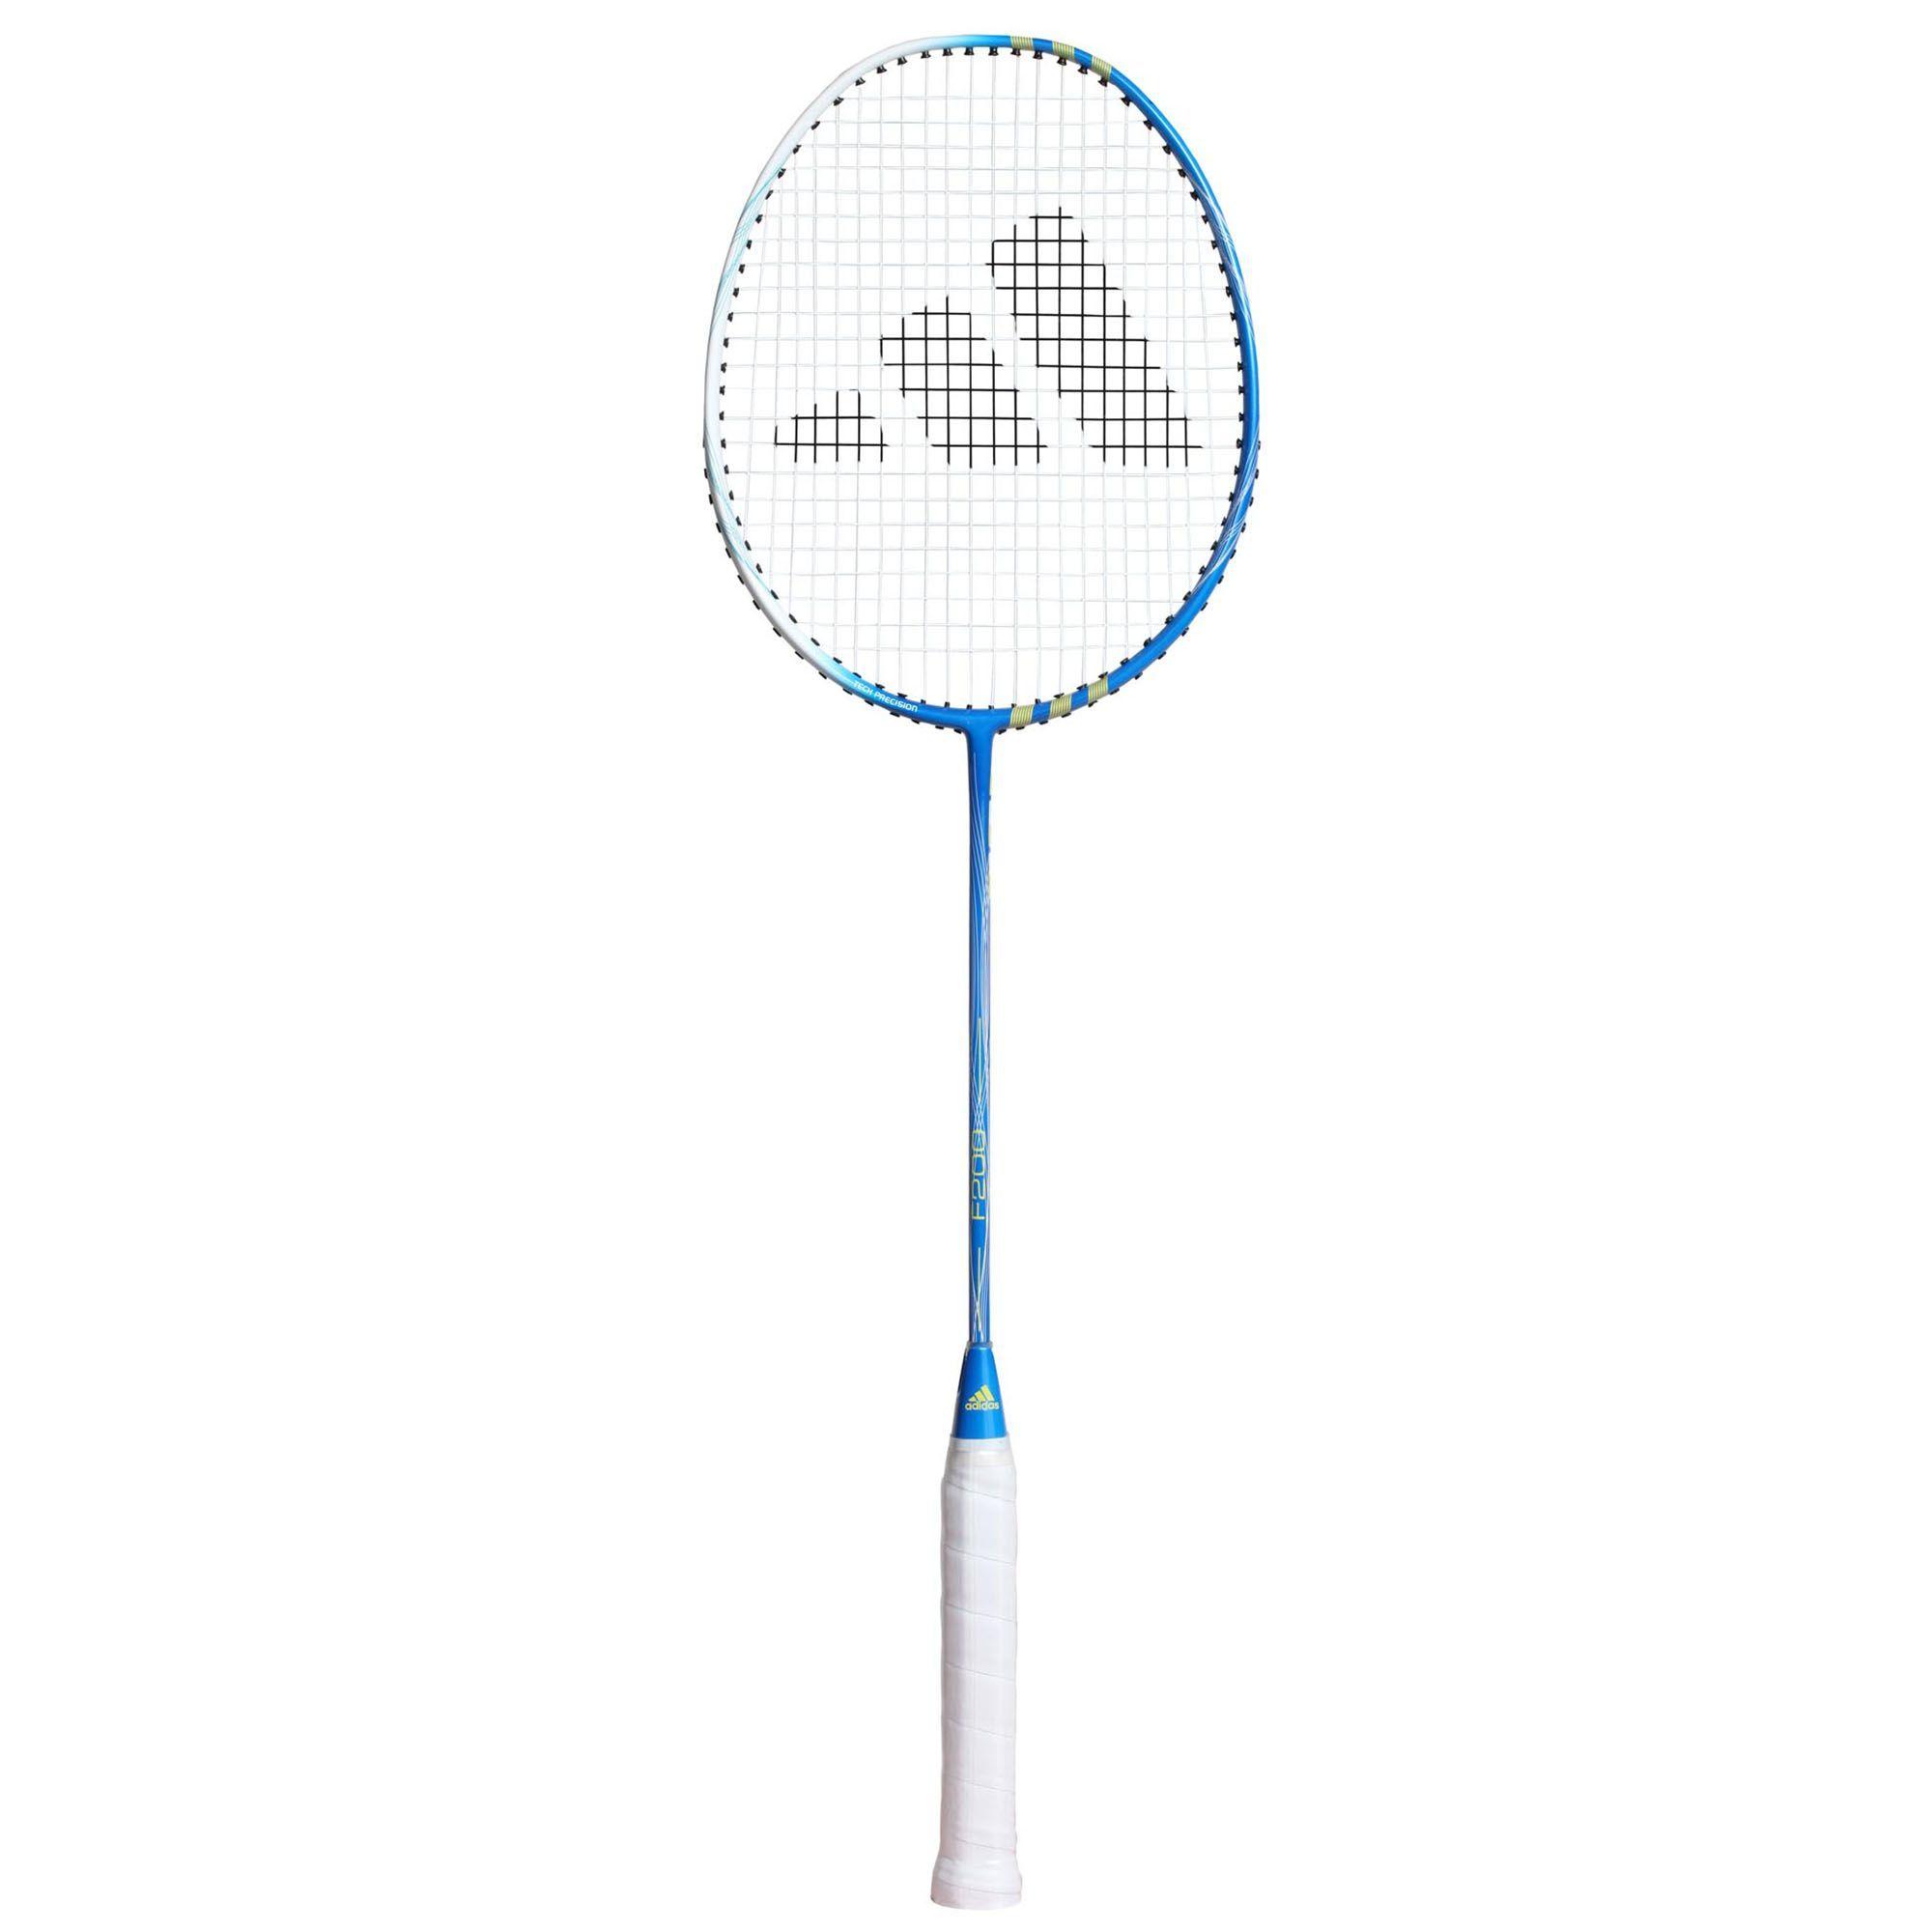 adidas F200 Badminton Racket Sweatbandcom | SPORTS GOOD